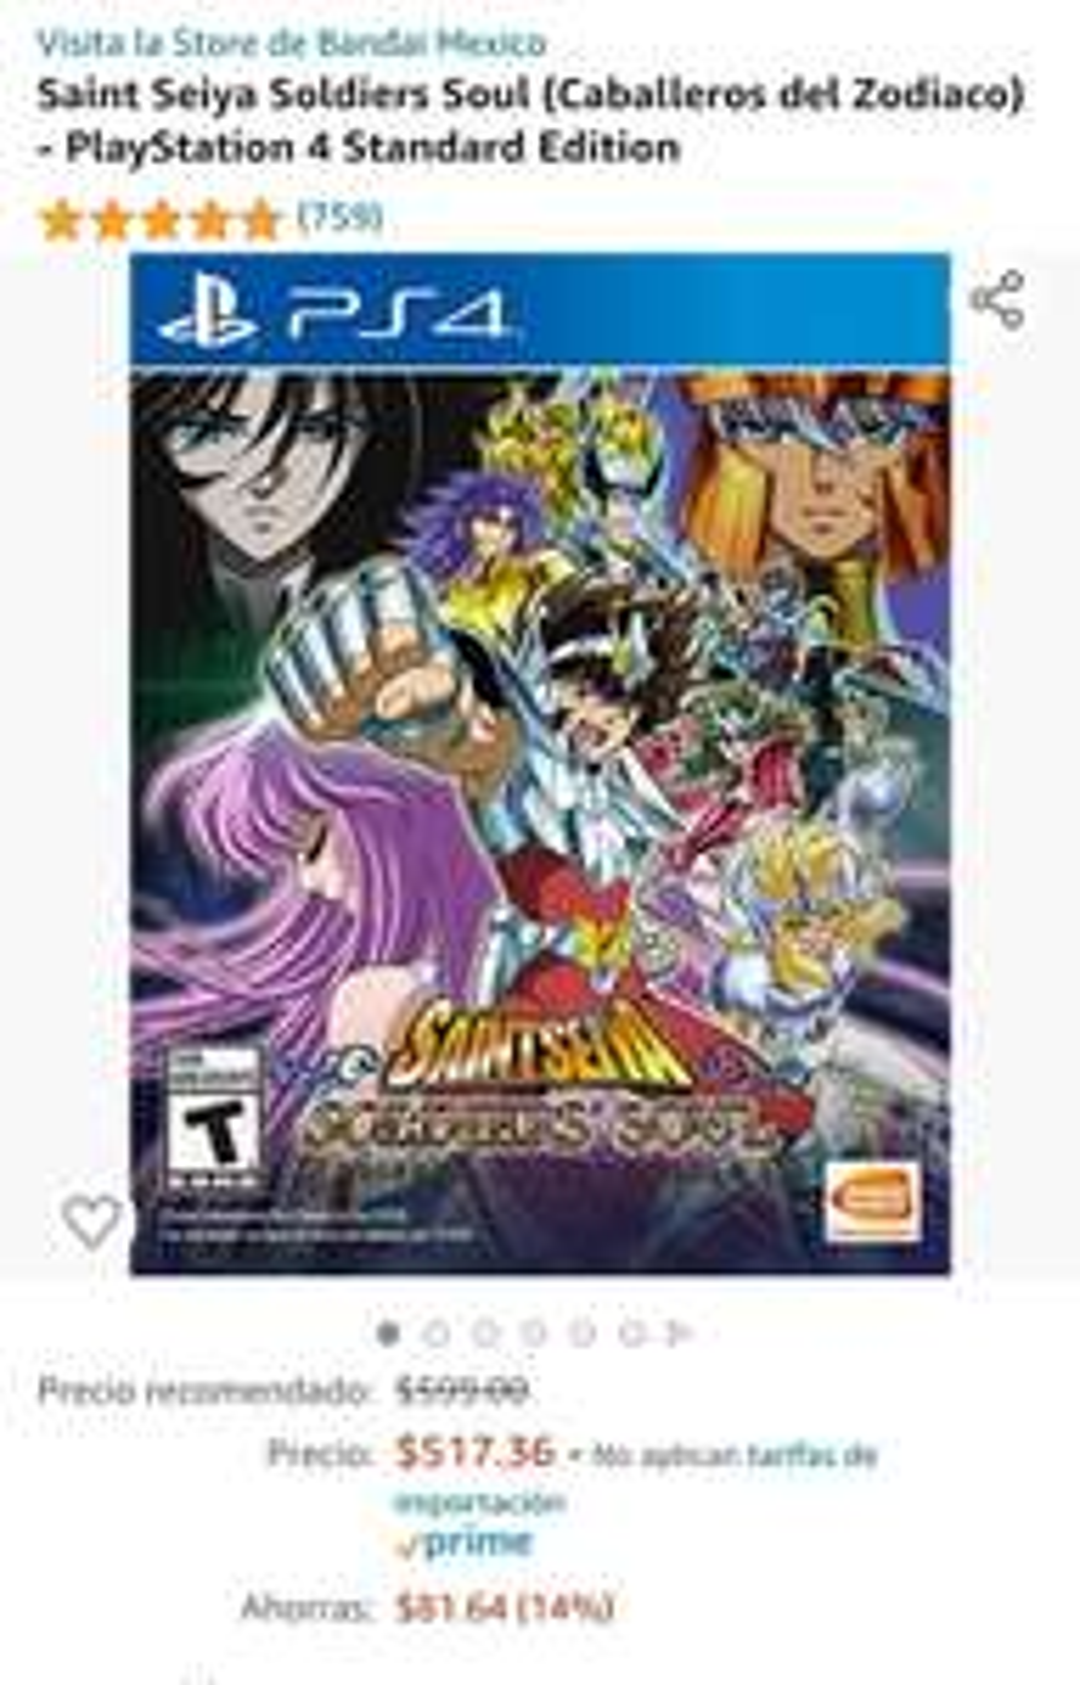 Amazon: Saint Seiya Soldiers Soul (Caballeros del Zodiaco) - PlayStation 4 Standard Edition